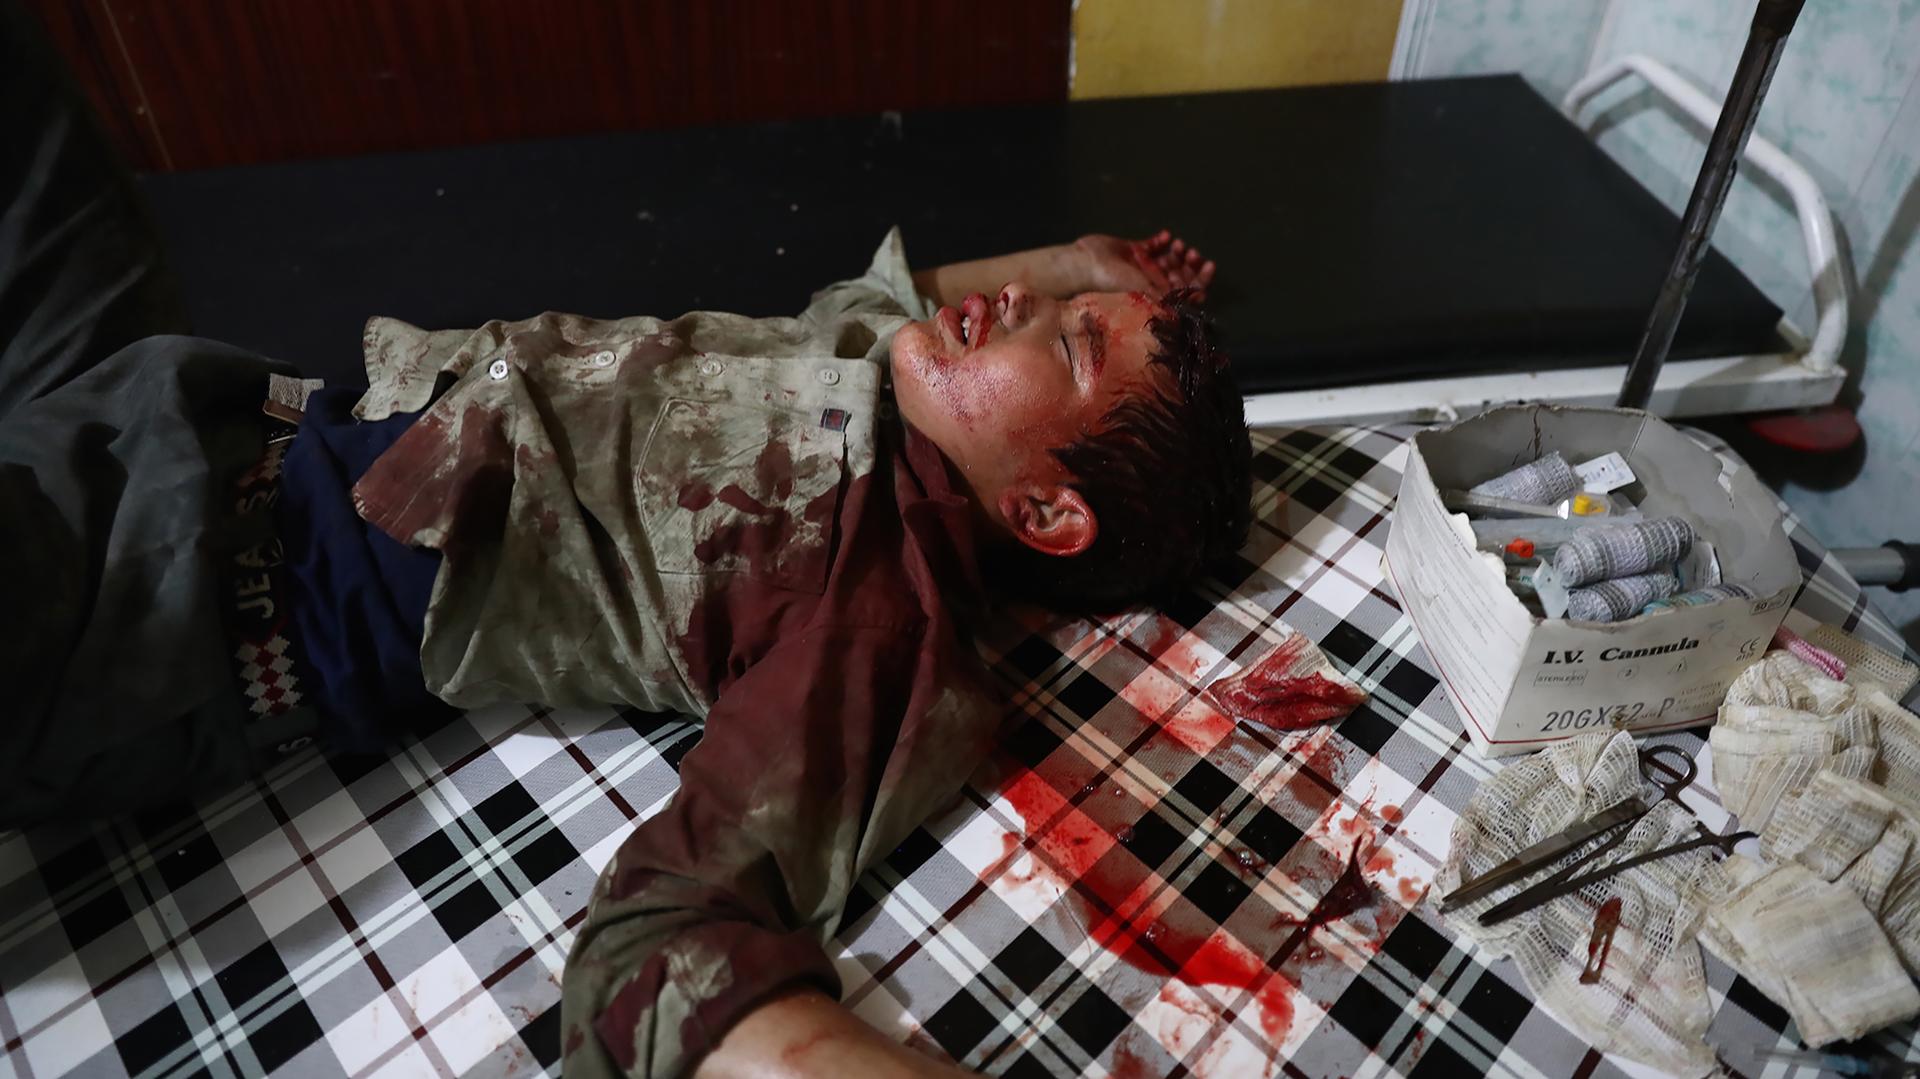 Un niño sirio herido espera ser atendido en un hospital provisorio después de un ataque aéreo en la ciudad siria de Douma/ AFP PHOTO / Abd Doumany